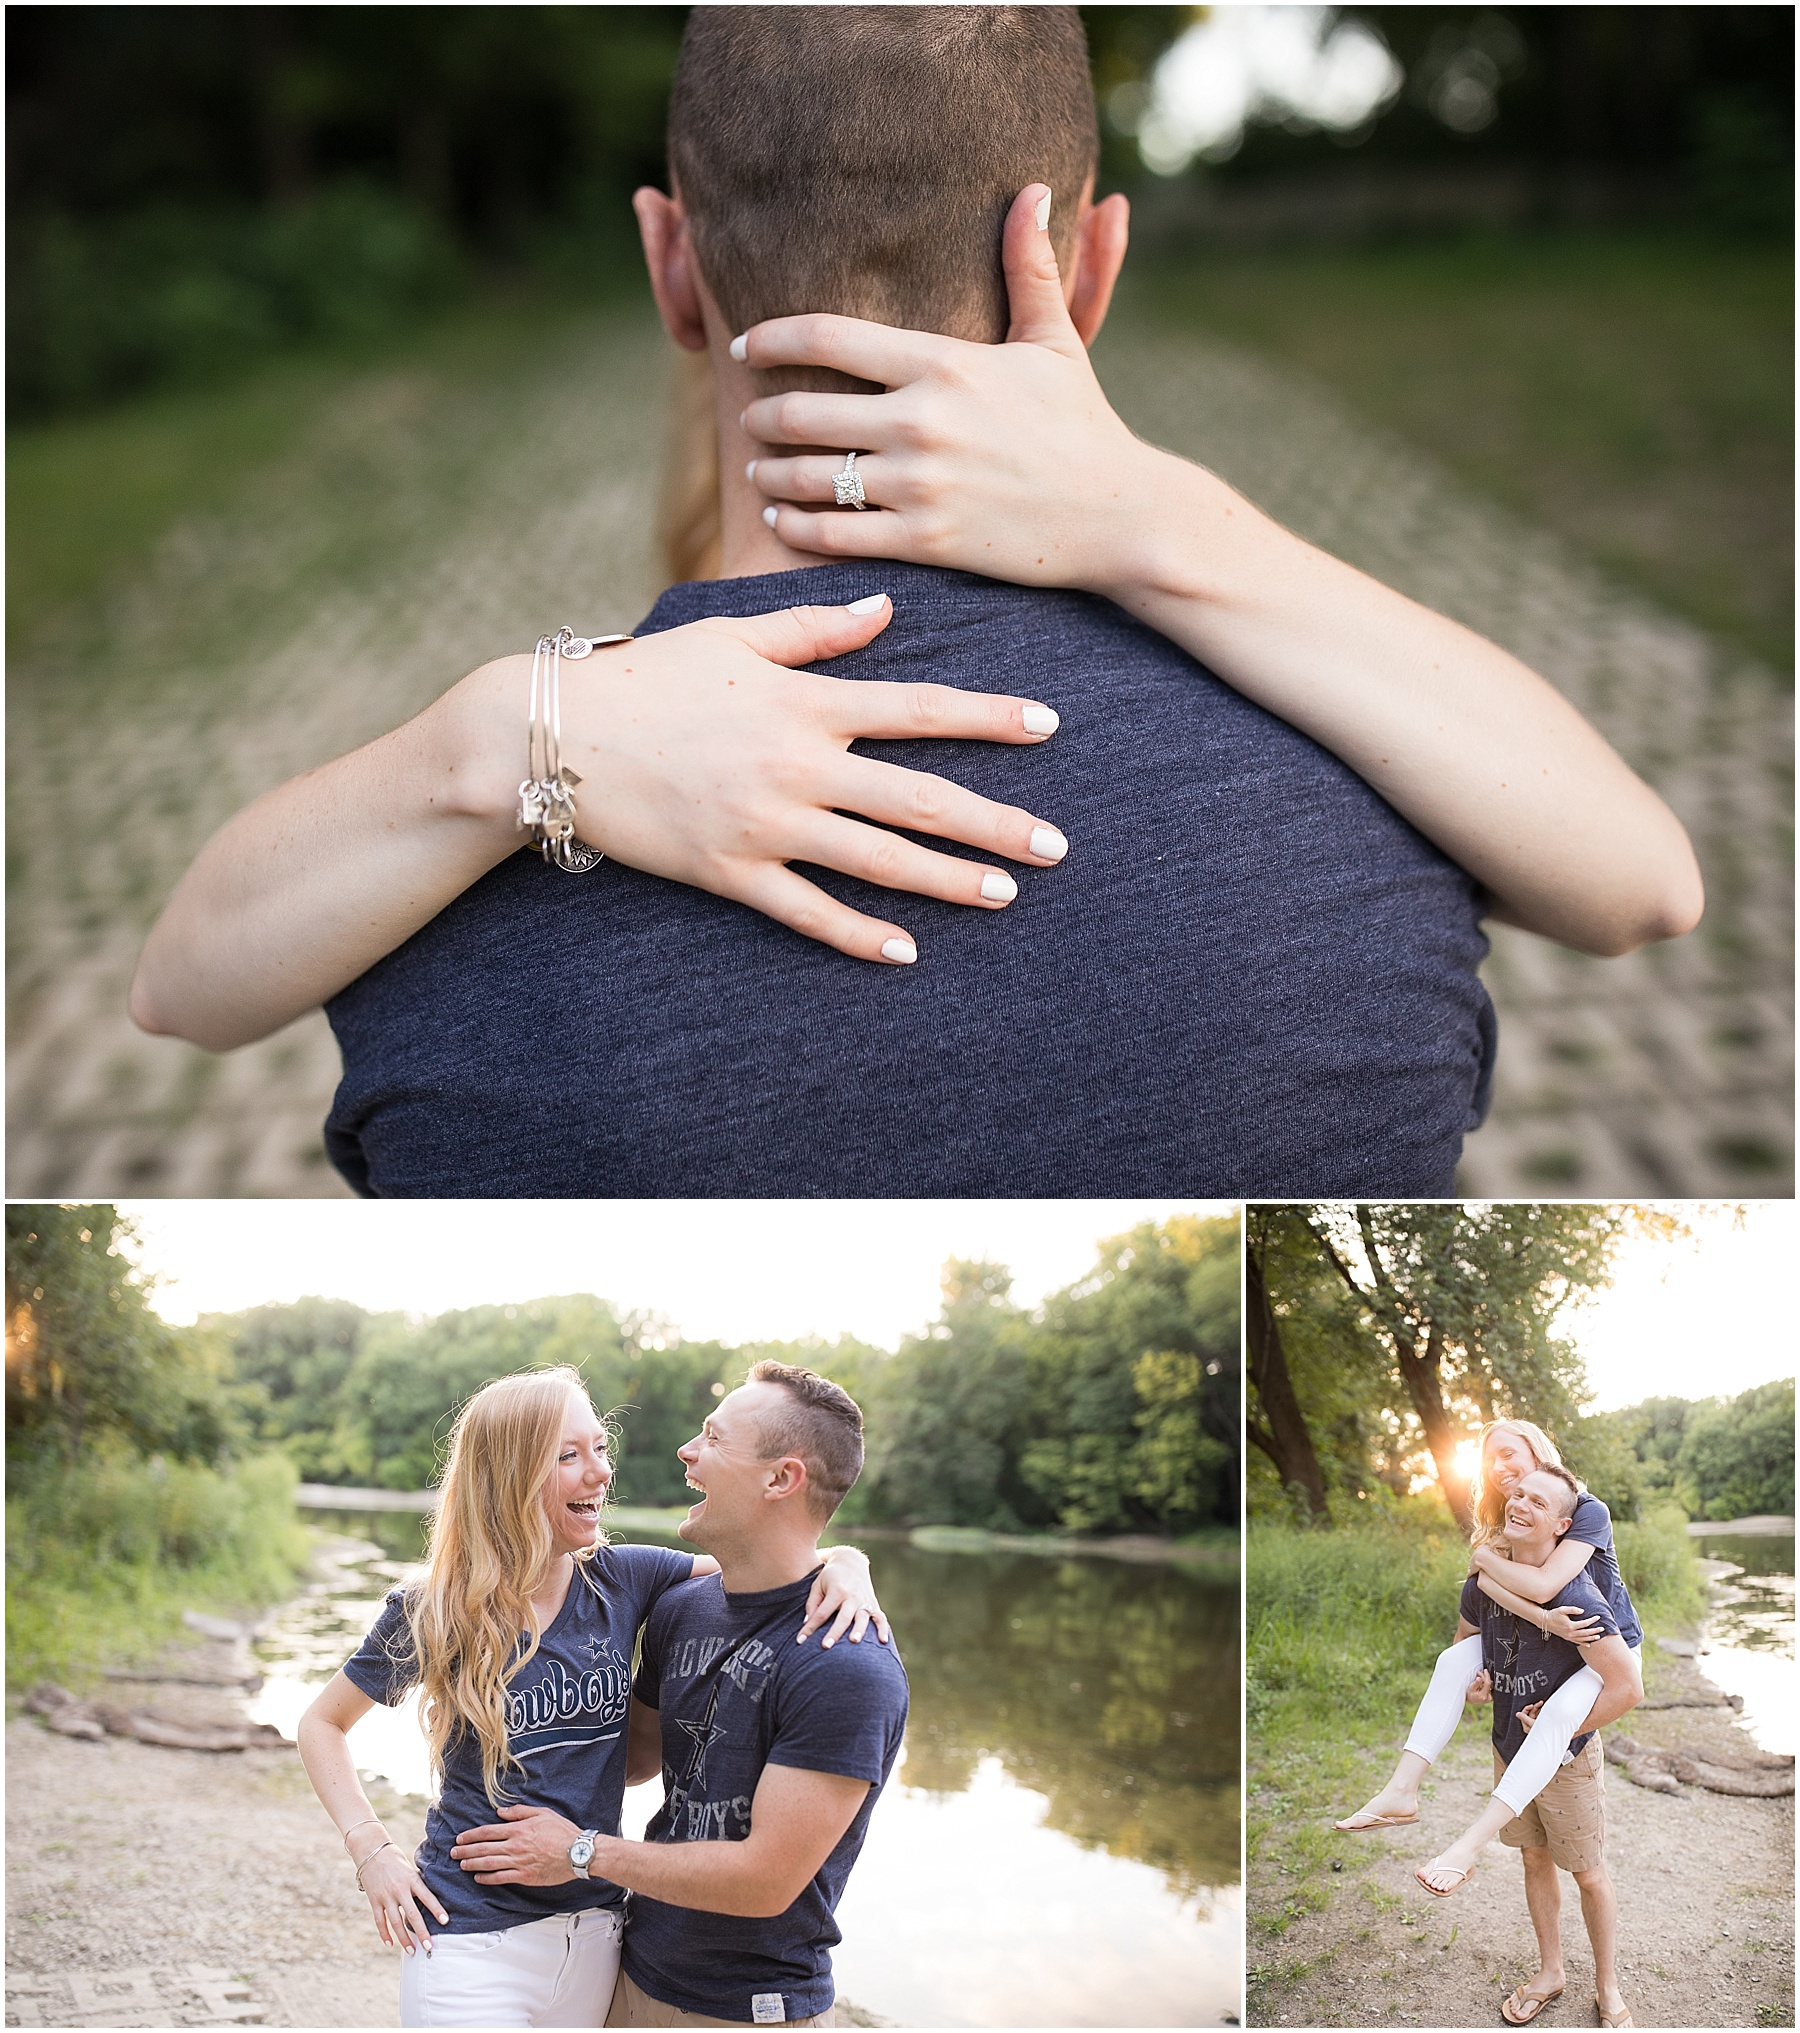 Love the one whom makes your laugh. Indianapolis Engagement Photographer. Raindancer Studios